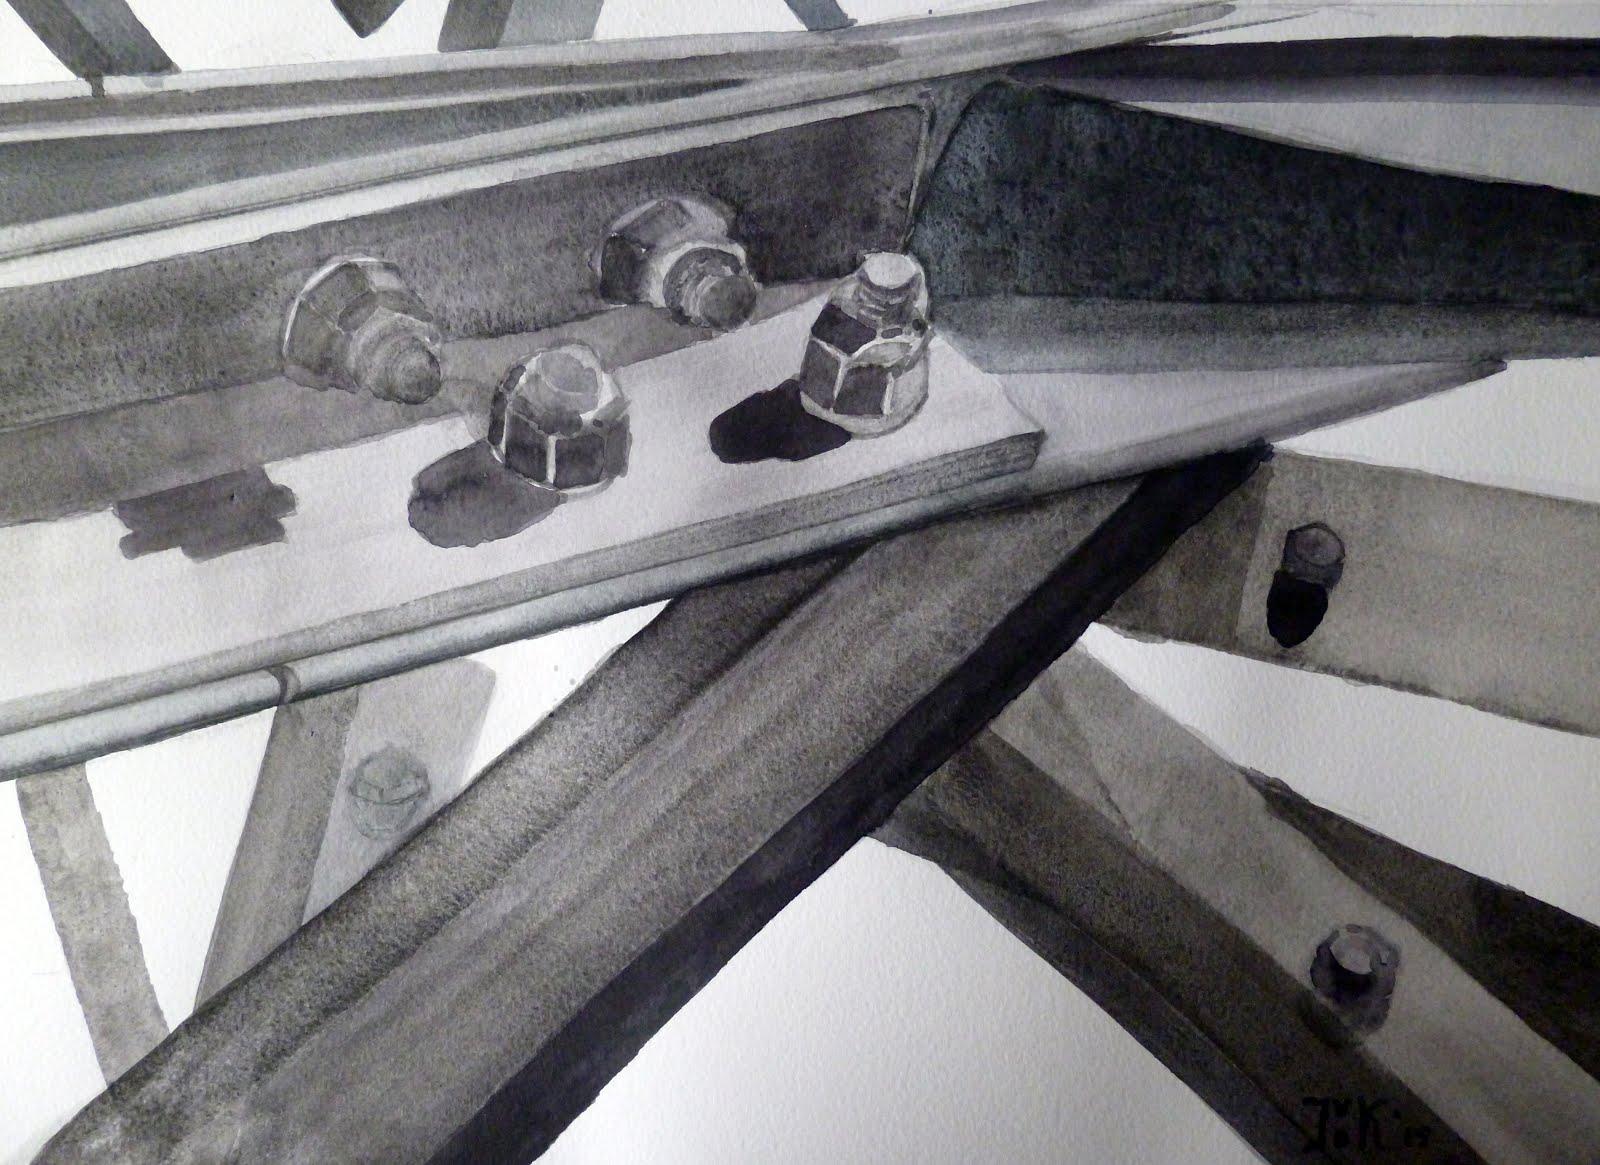 Verbinding van metaal